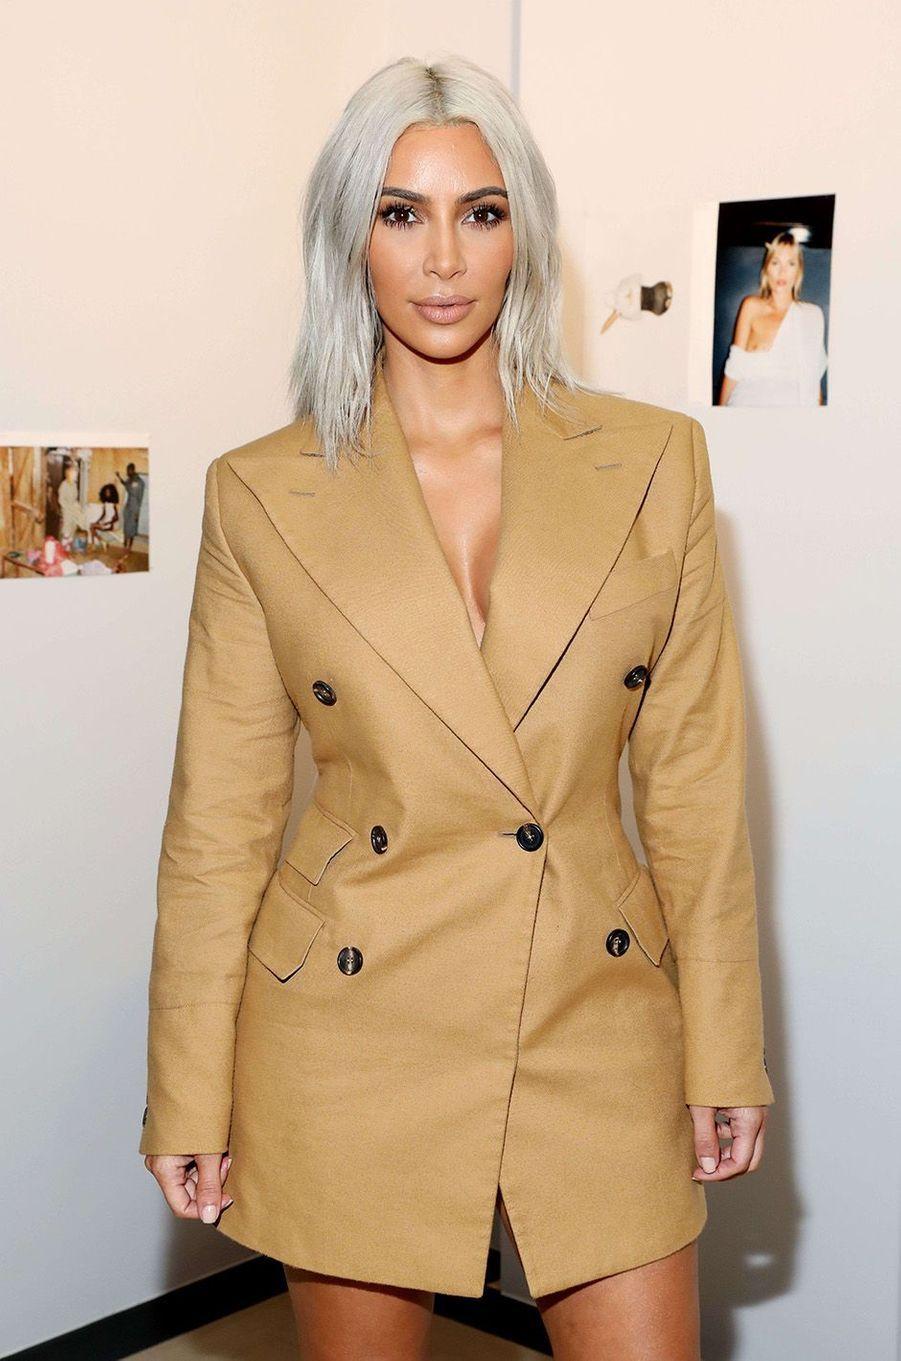 Kim Kardashian lors de la soirée Vivienne Westwood x Juergen Tuller.